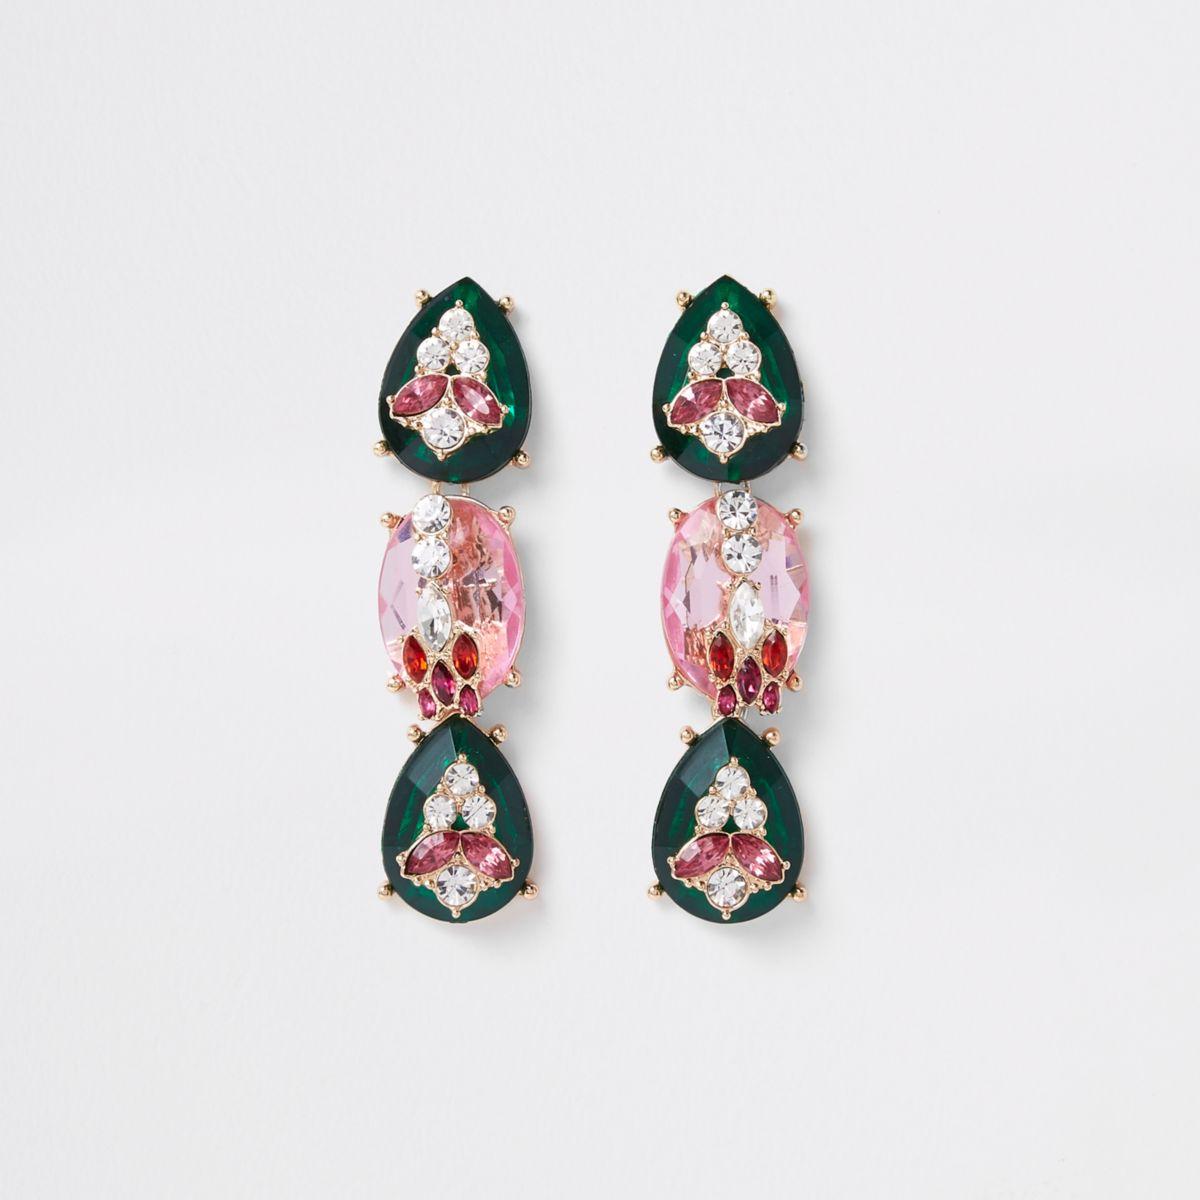 Green jewel encrusted drop stud earrings